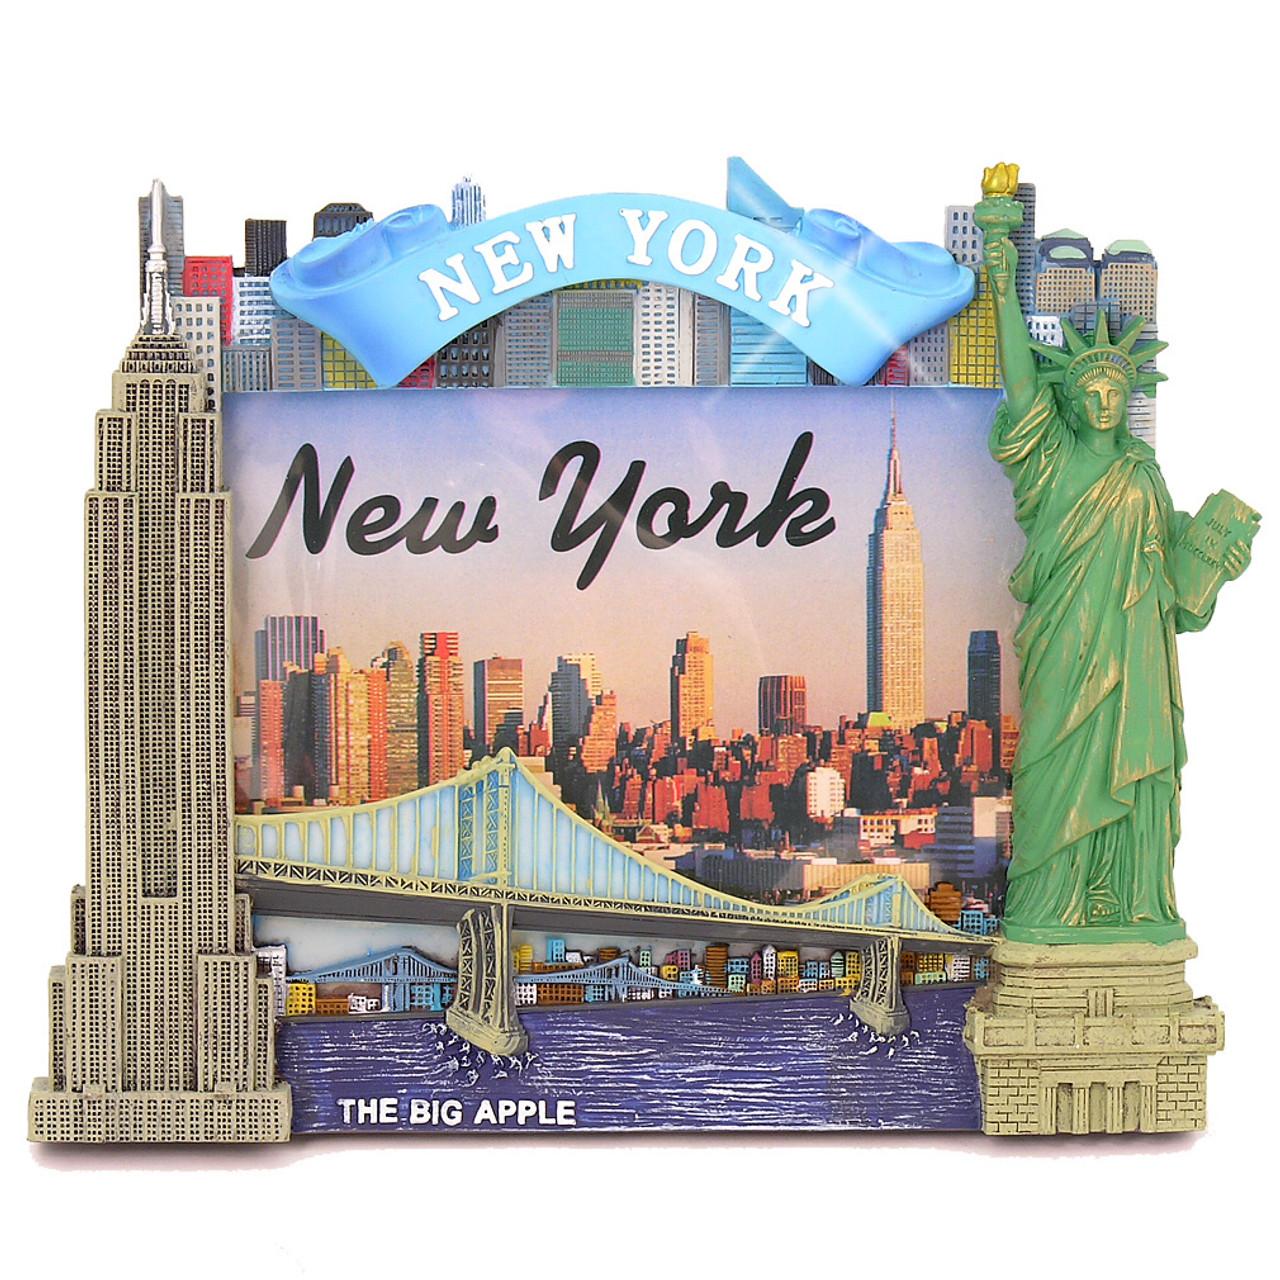 NY Skyline Picture Frames with New York City Skyline Landmarks